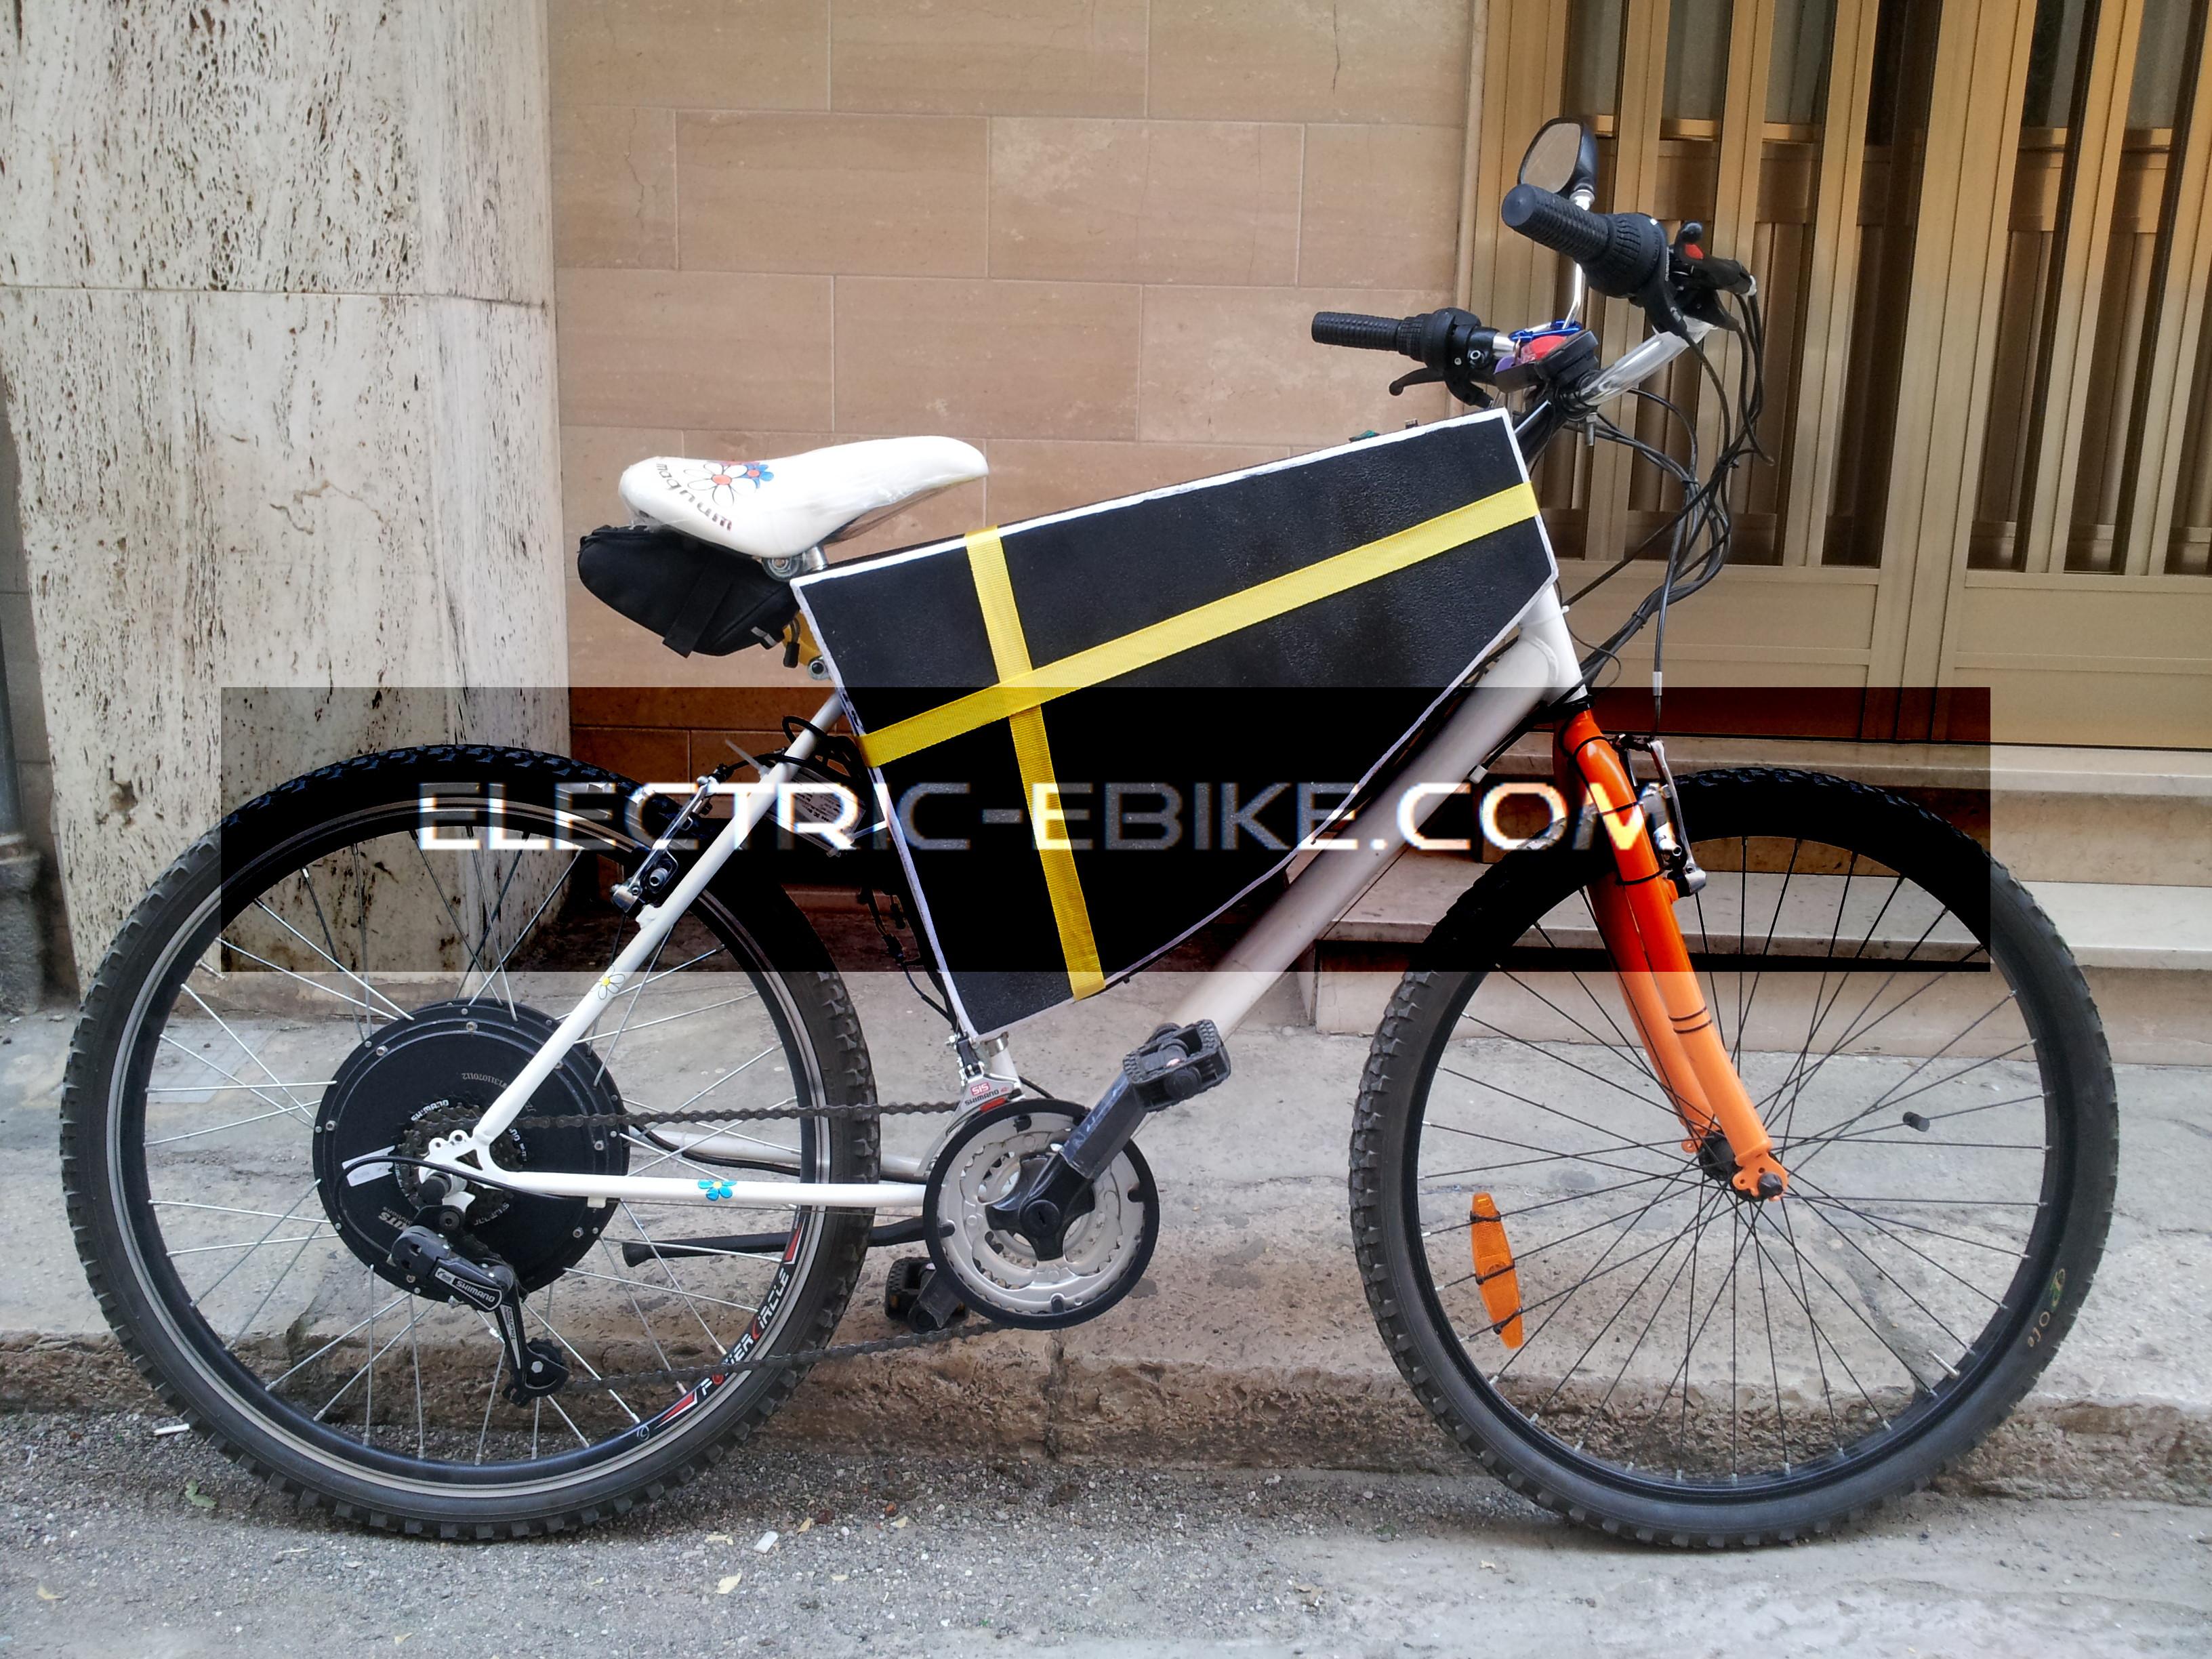 Bicicletta Elettrica Autocostruita Electric Ebikecomit